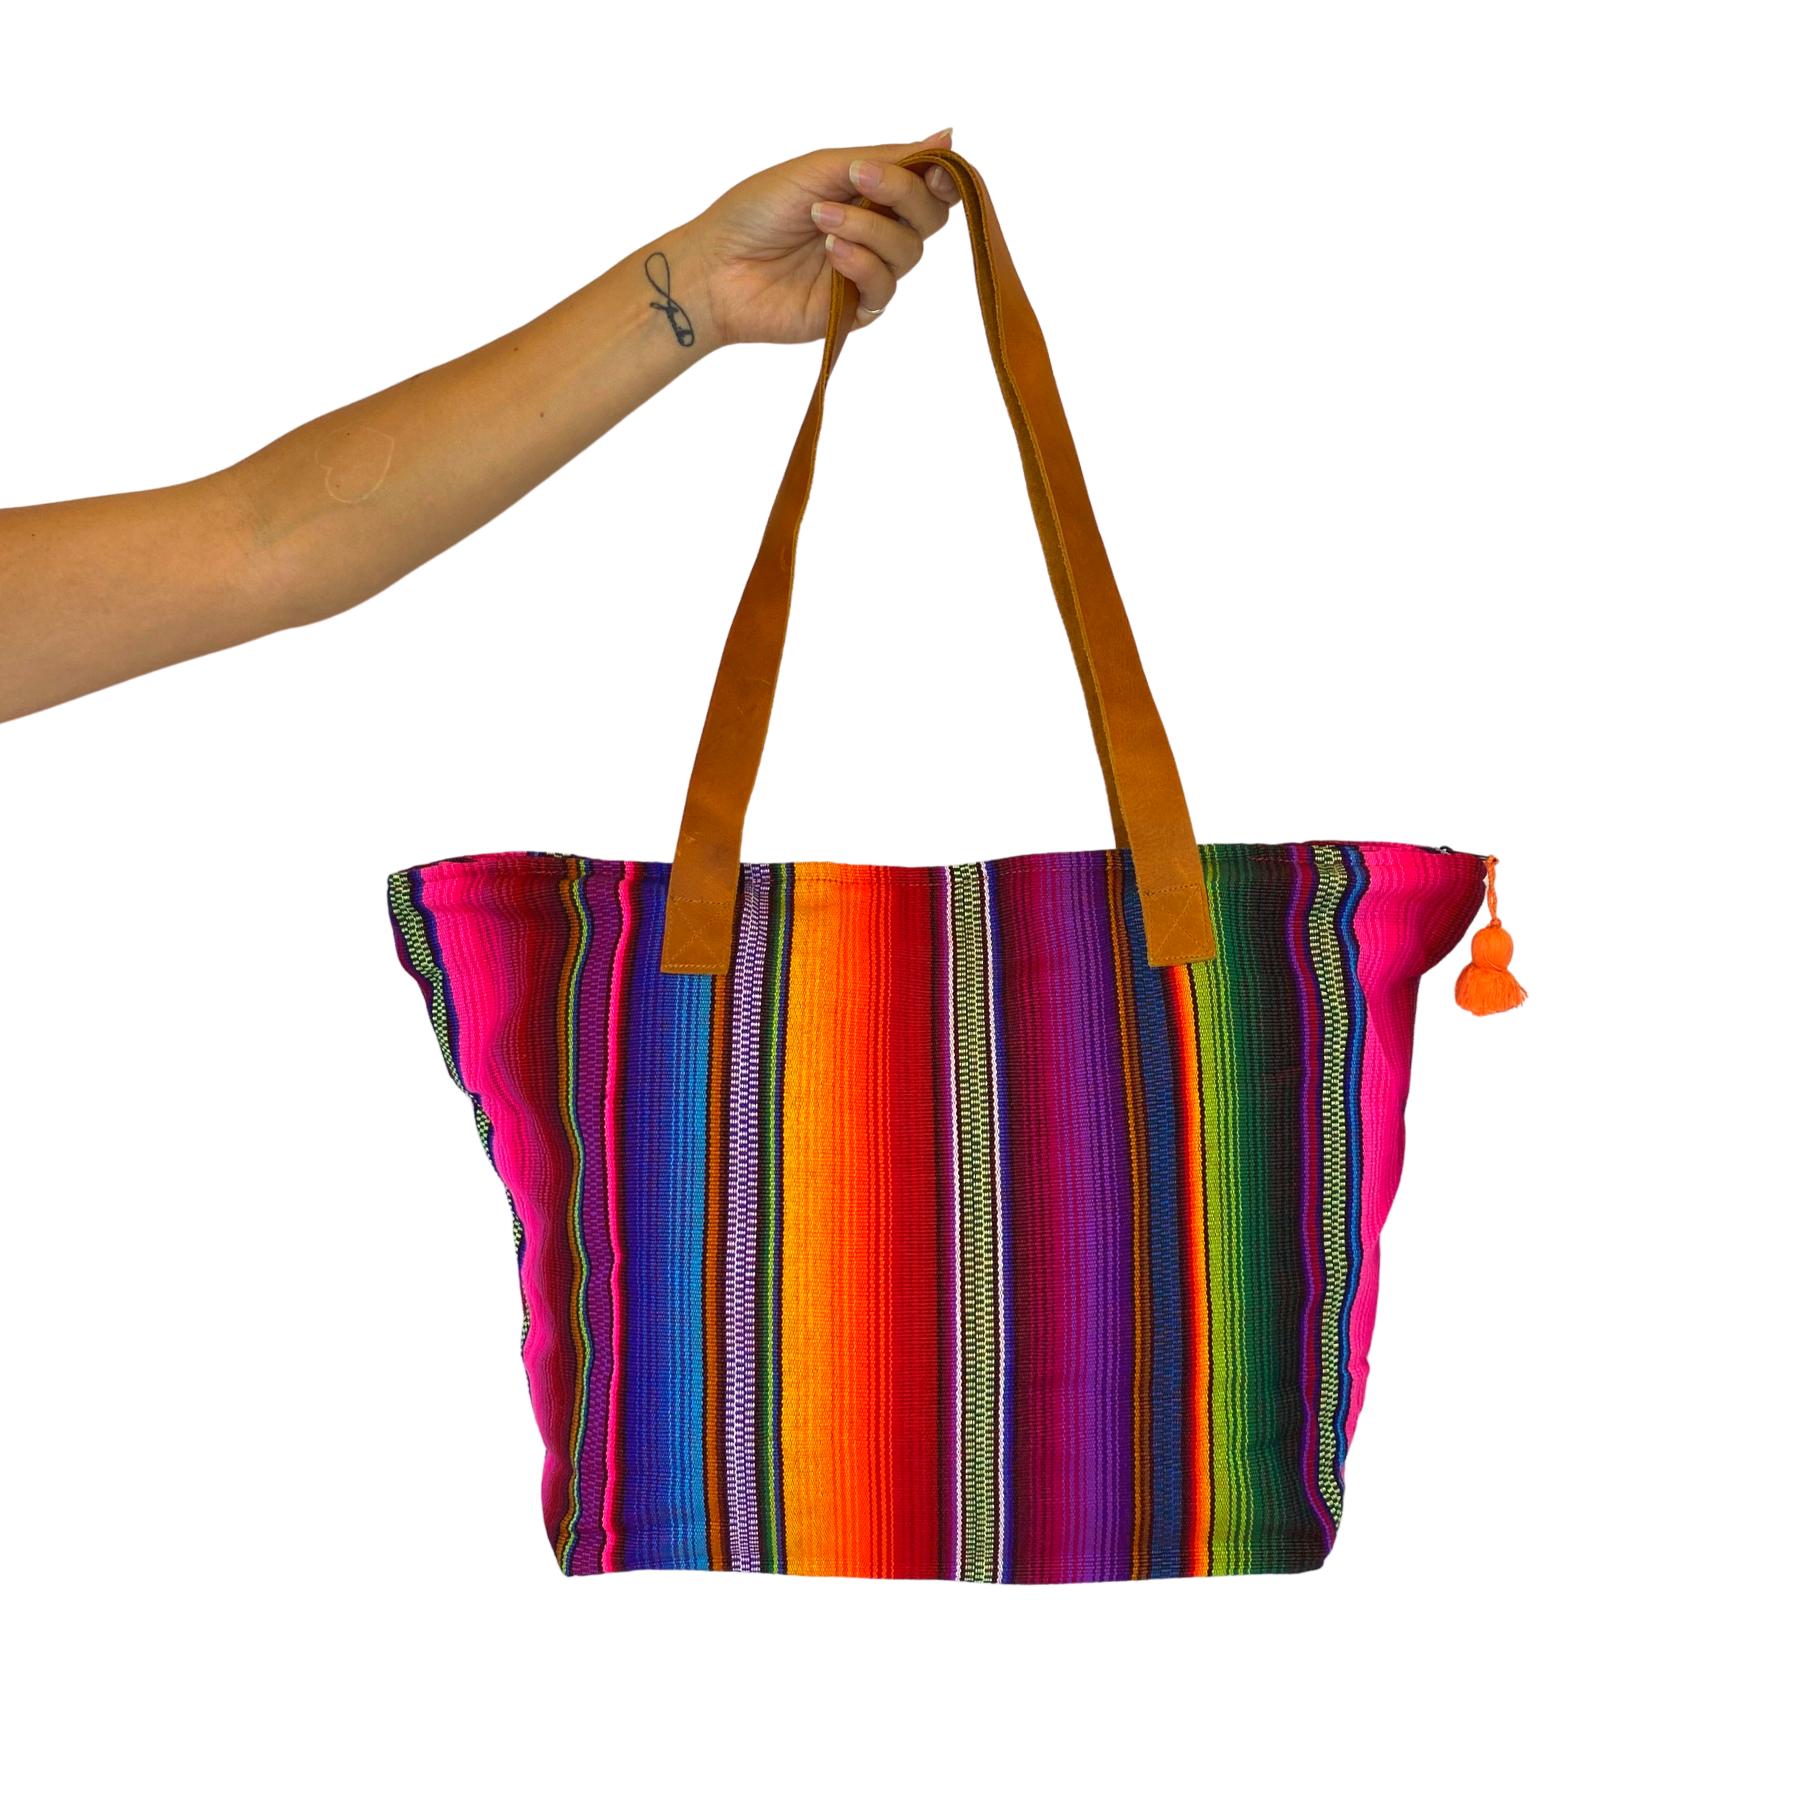 carry-all Tote bag Pueblo purse southwest design baby bag handbag knitting bag shopping tote